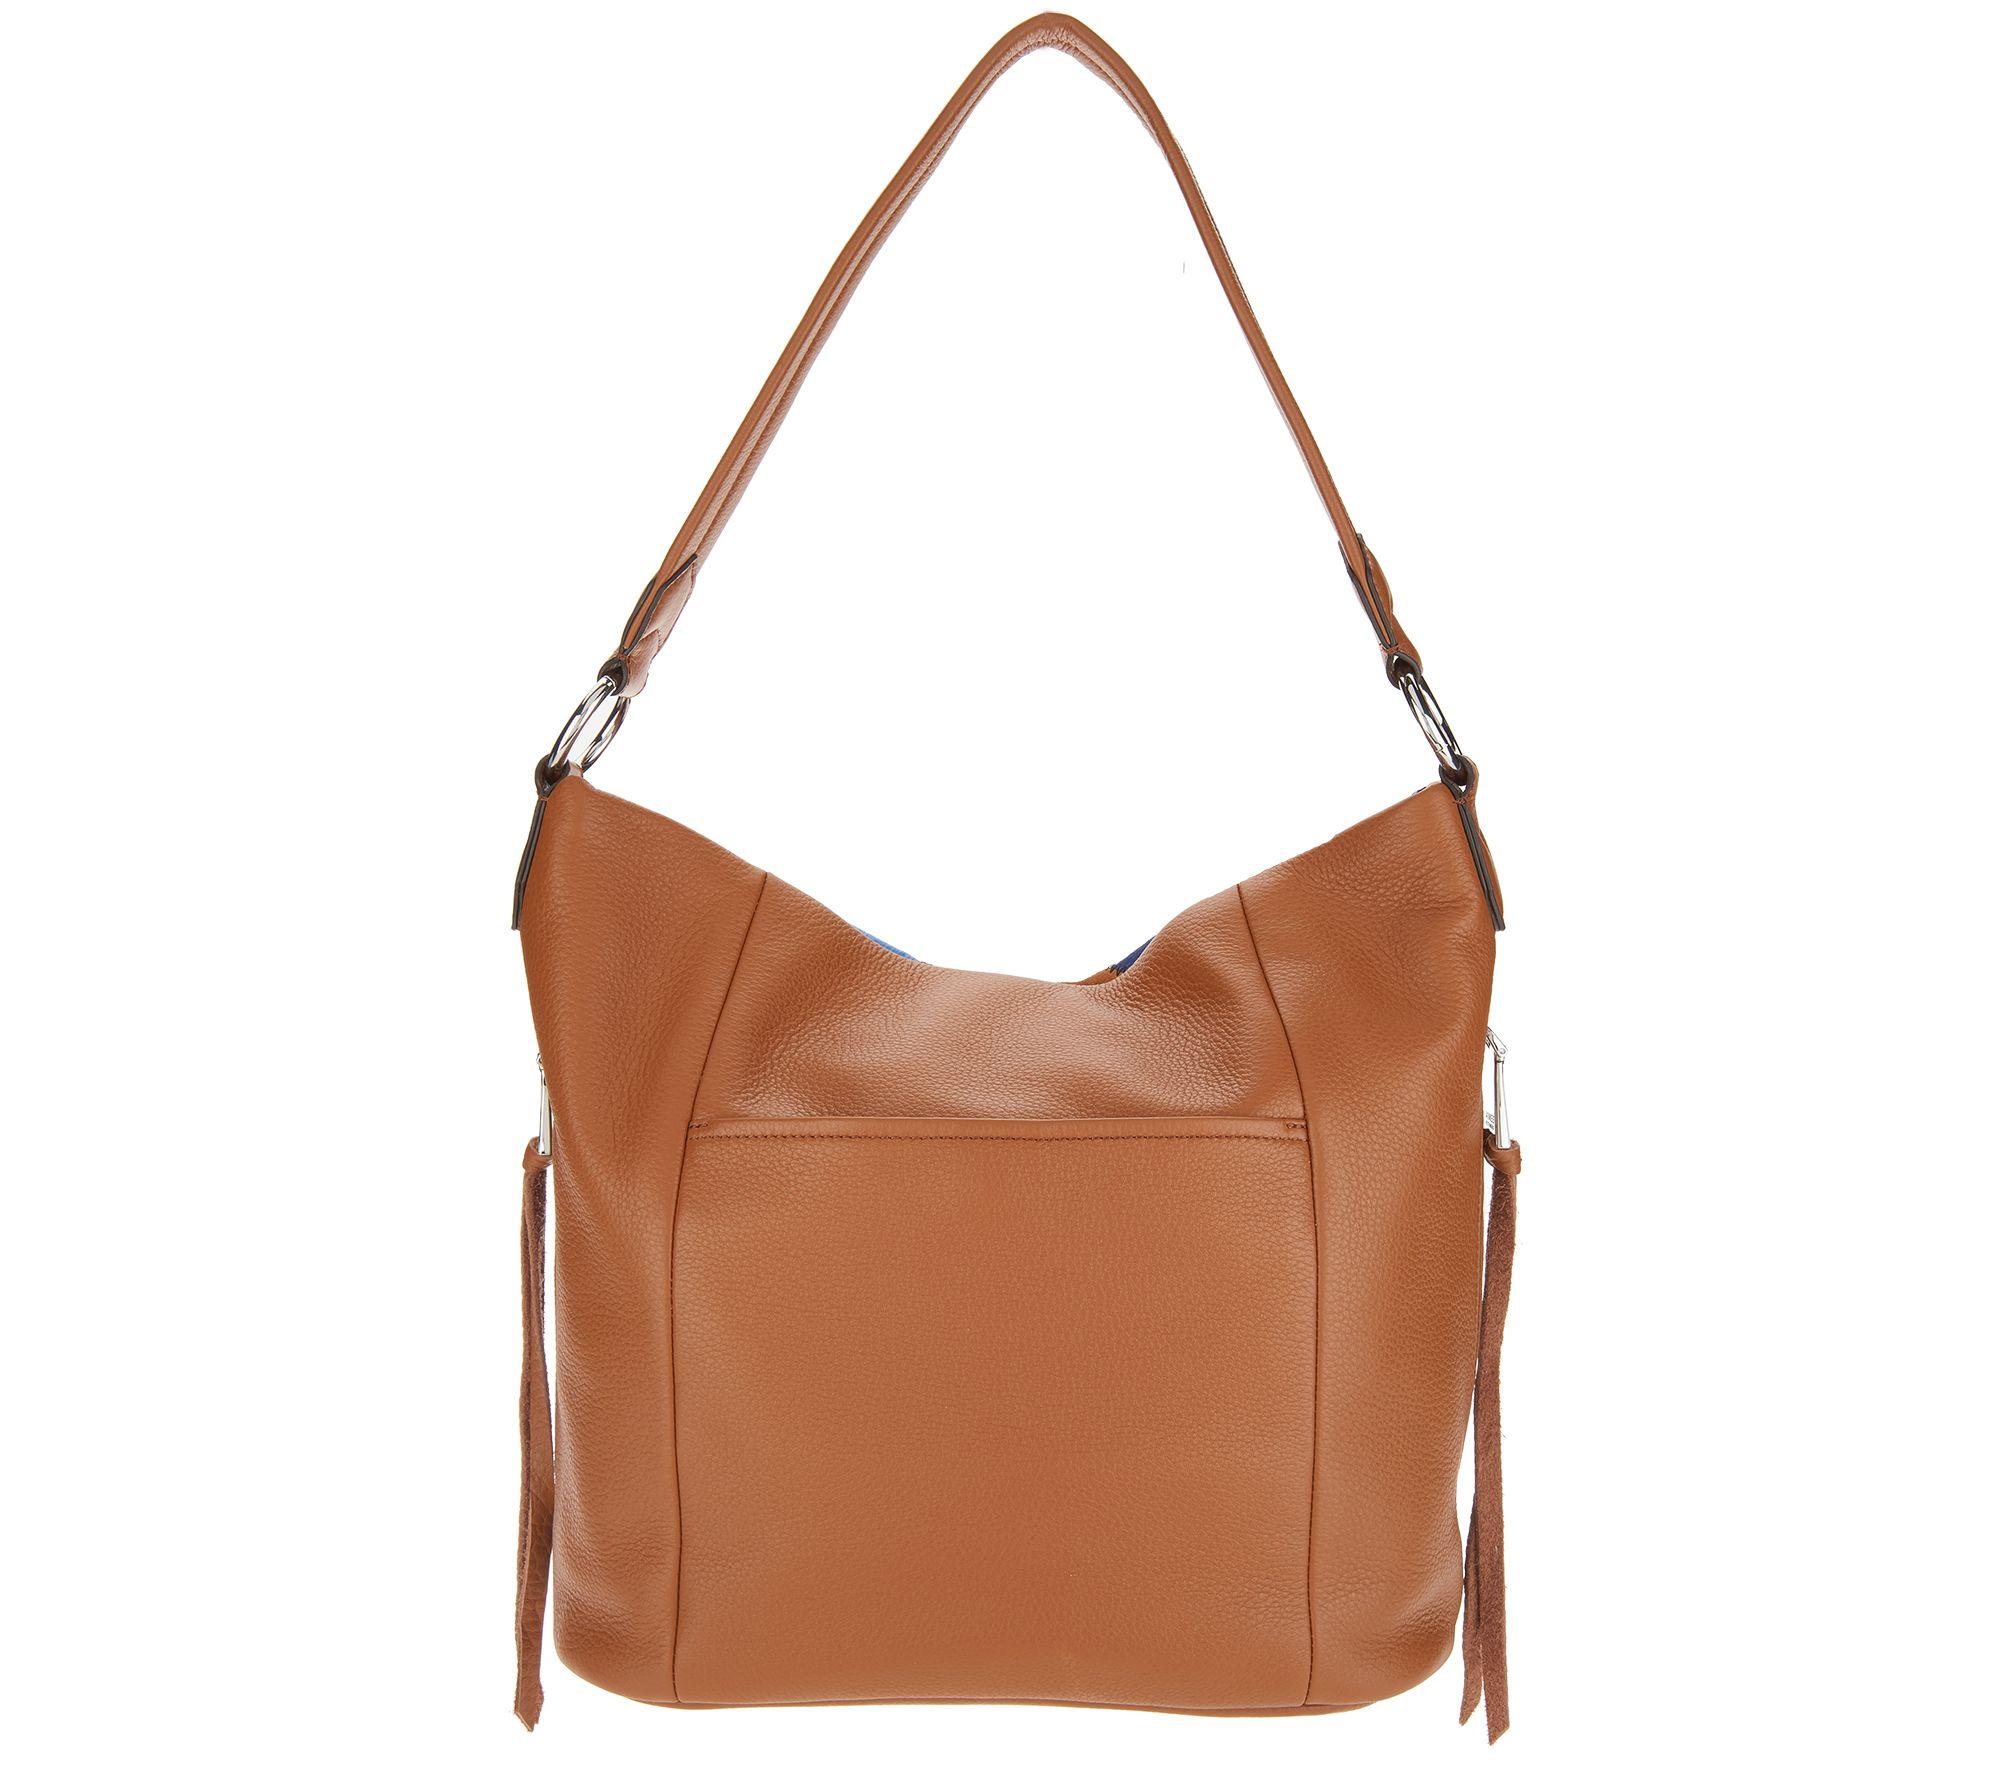 8b66781a60d5 Aimee Kestenberg Pebble Leather Hobo - Tulum - Page 1 — QVC.com